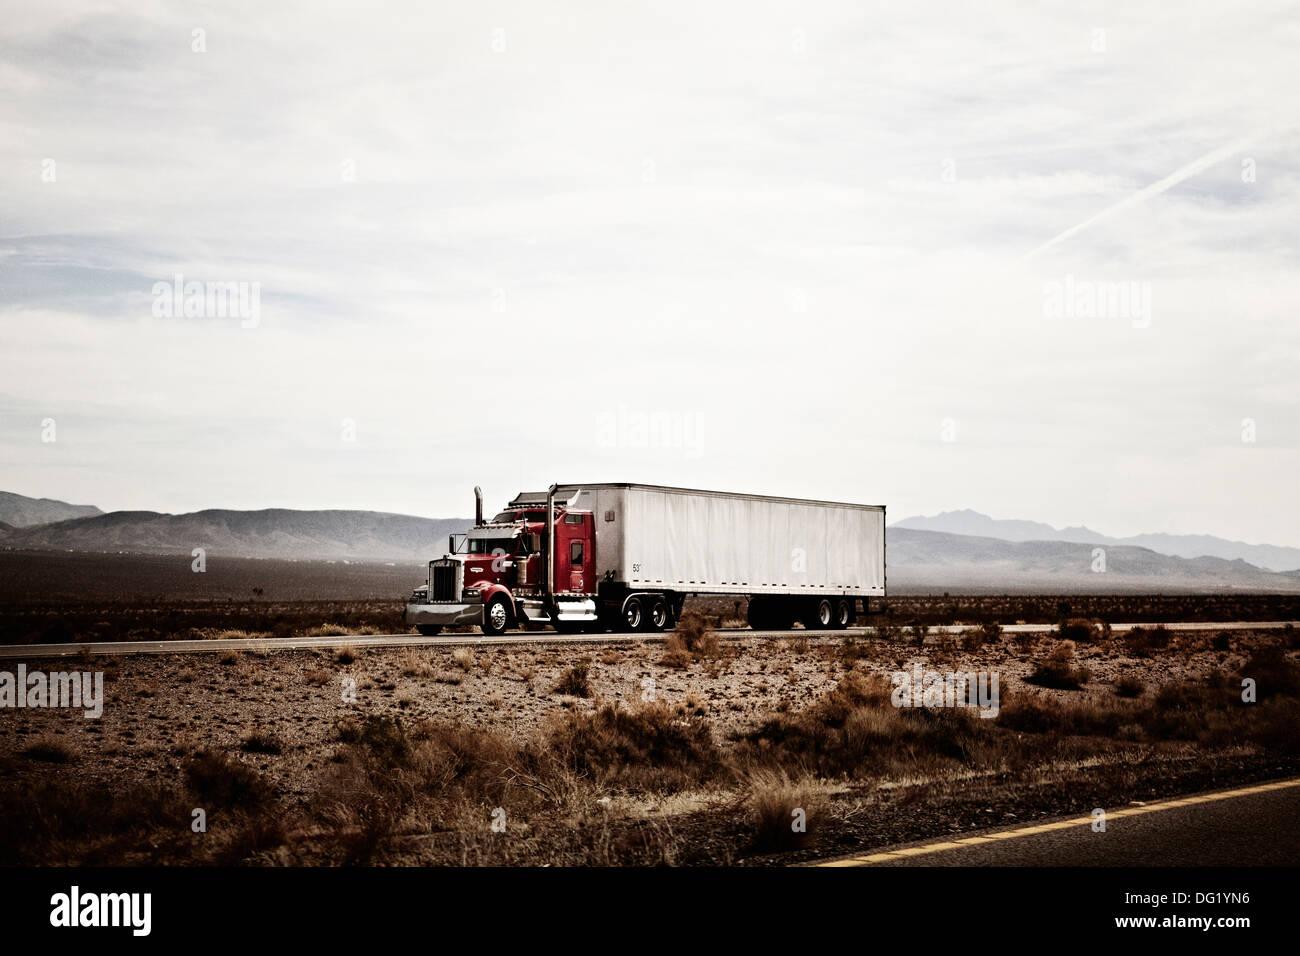 18-Wheel Truck on Desert Highway, Arizona, USA - Stock Image